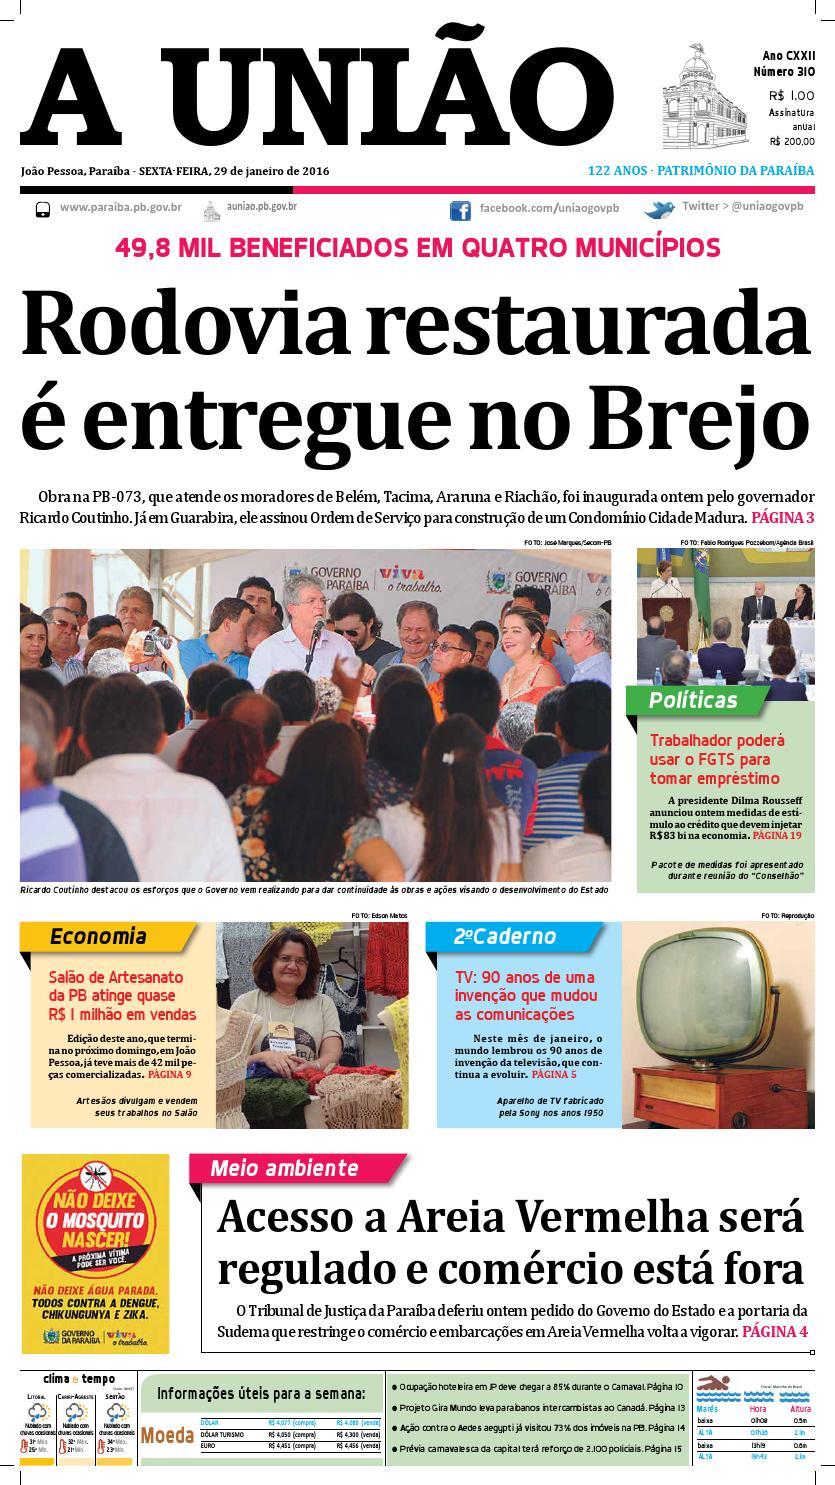 f328e92701 Jornal A União 29 01 16 by Jornal A União - issuu